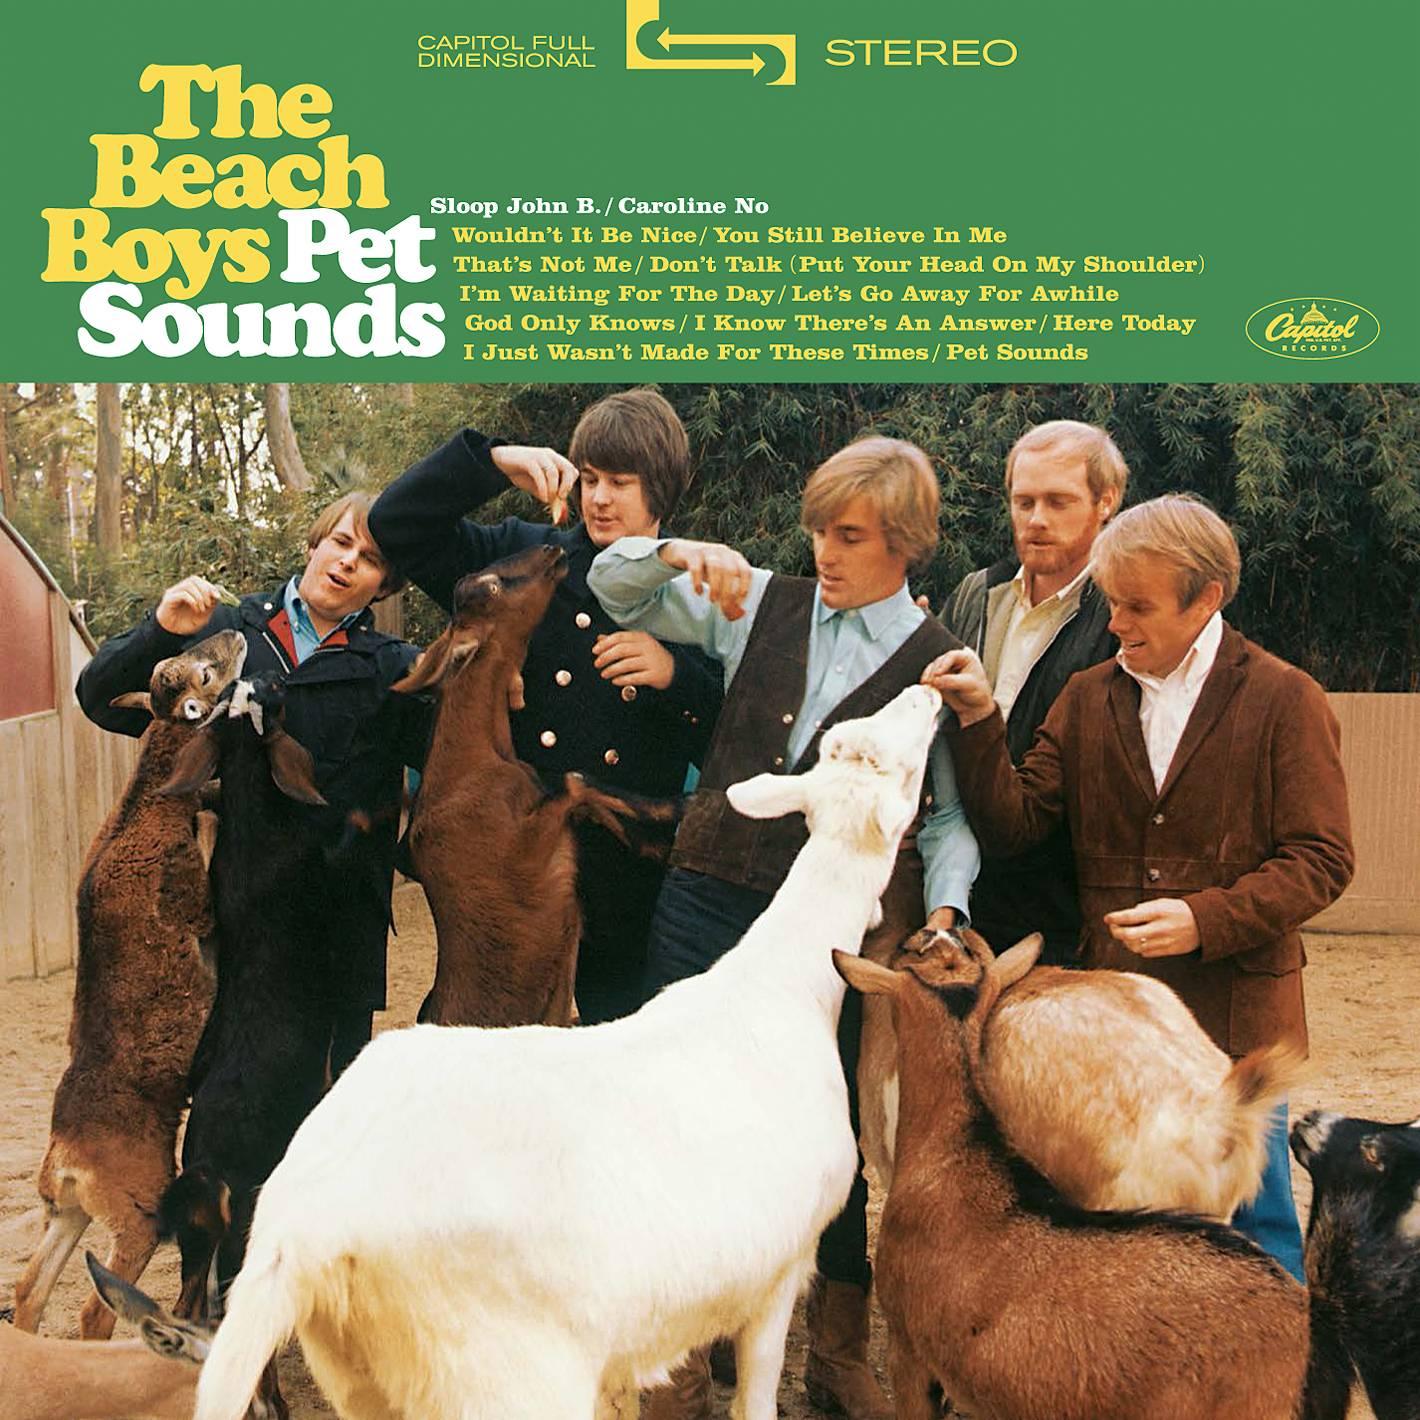 The Beach Boys - Pet Sounds (1966/2015/2017) [DSD64 + Hi-Res FLAC]